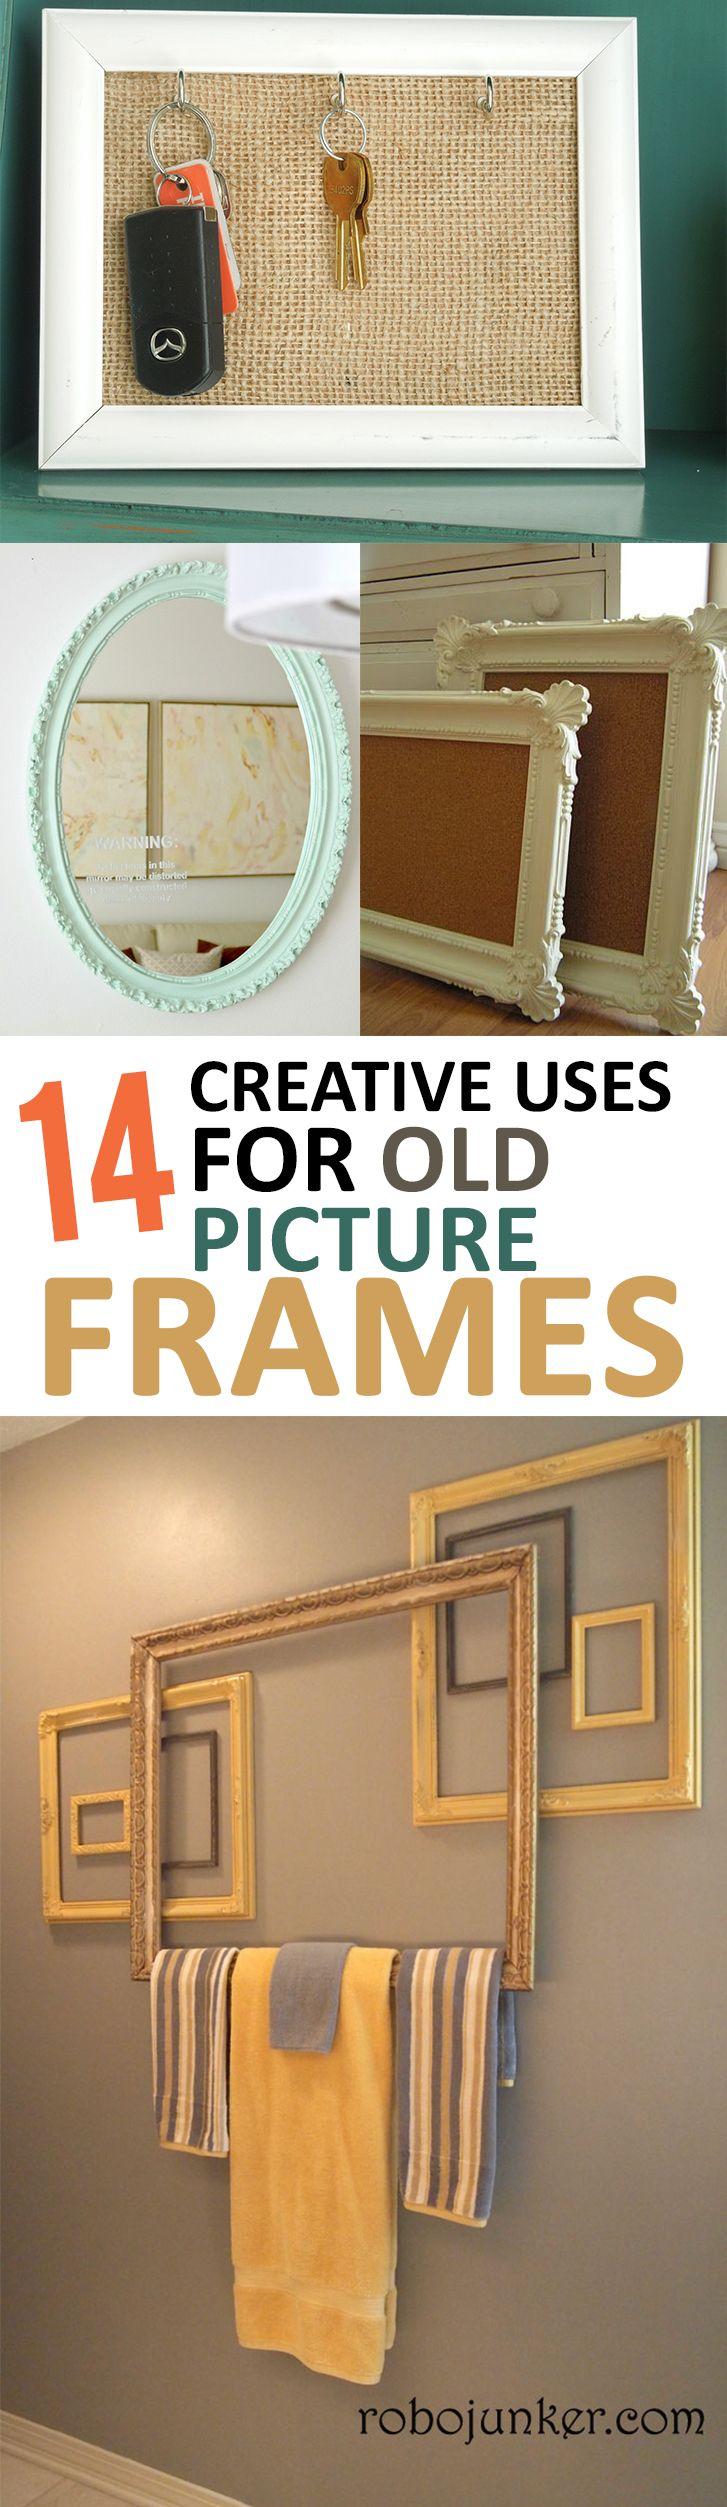 14 Creative Uses for Old Picture Frames | Bilderrahmen, Rund ums ...